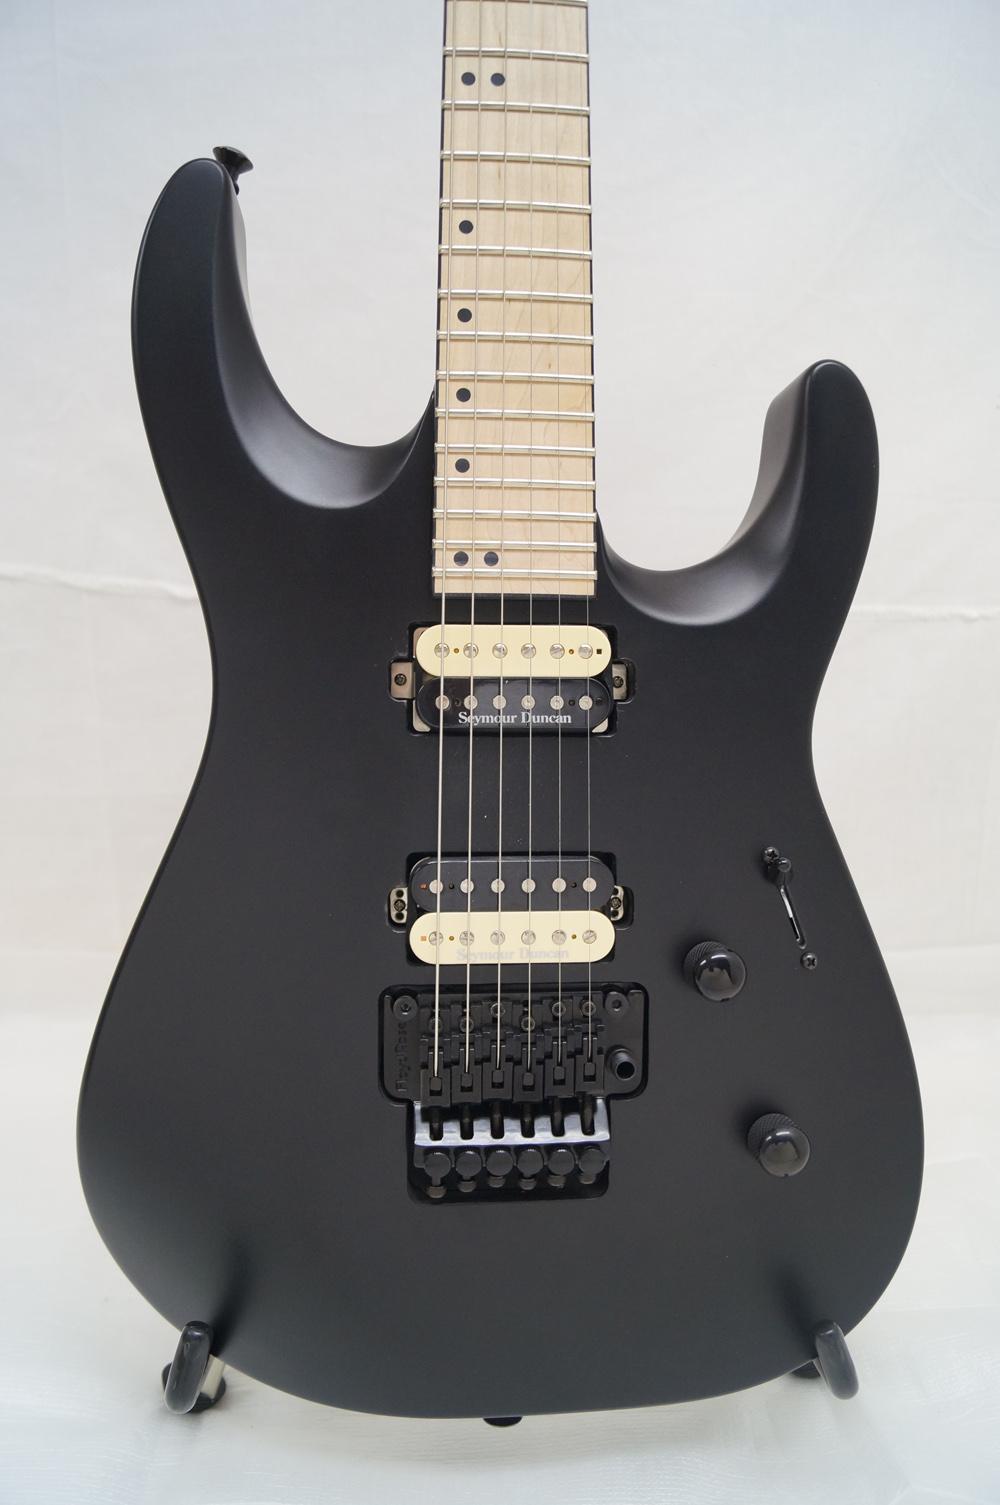 new jackson dk2m electric guitar satin black mim seymour duncan pus ebay. Black Bedroom Furniture Sets. Home Design Ideas